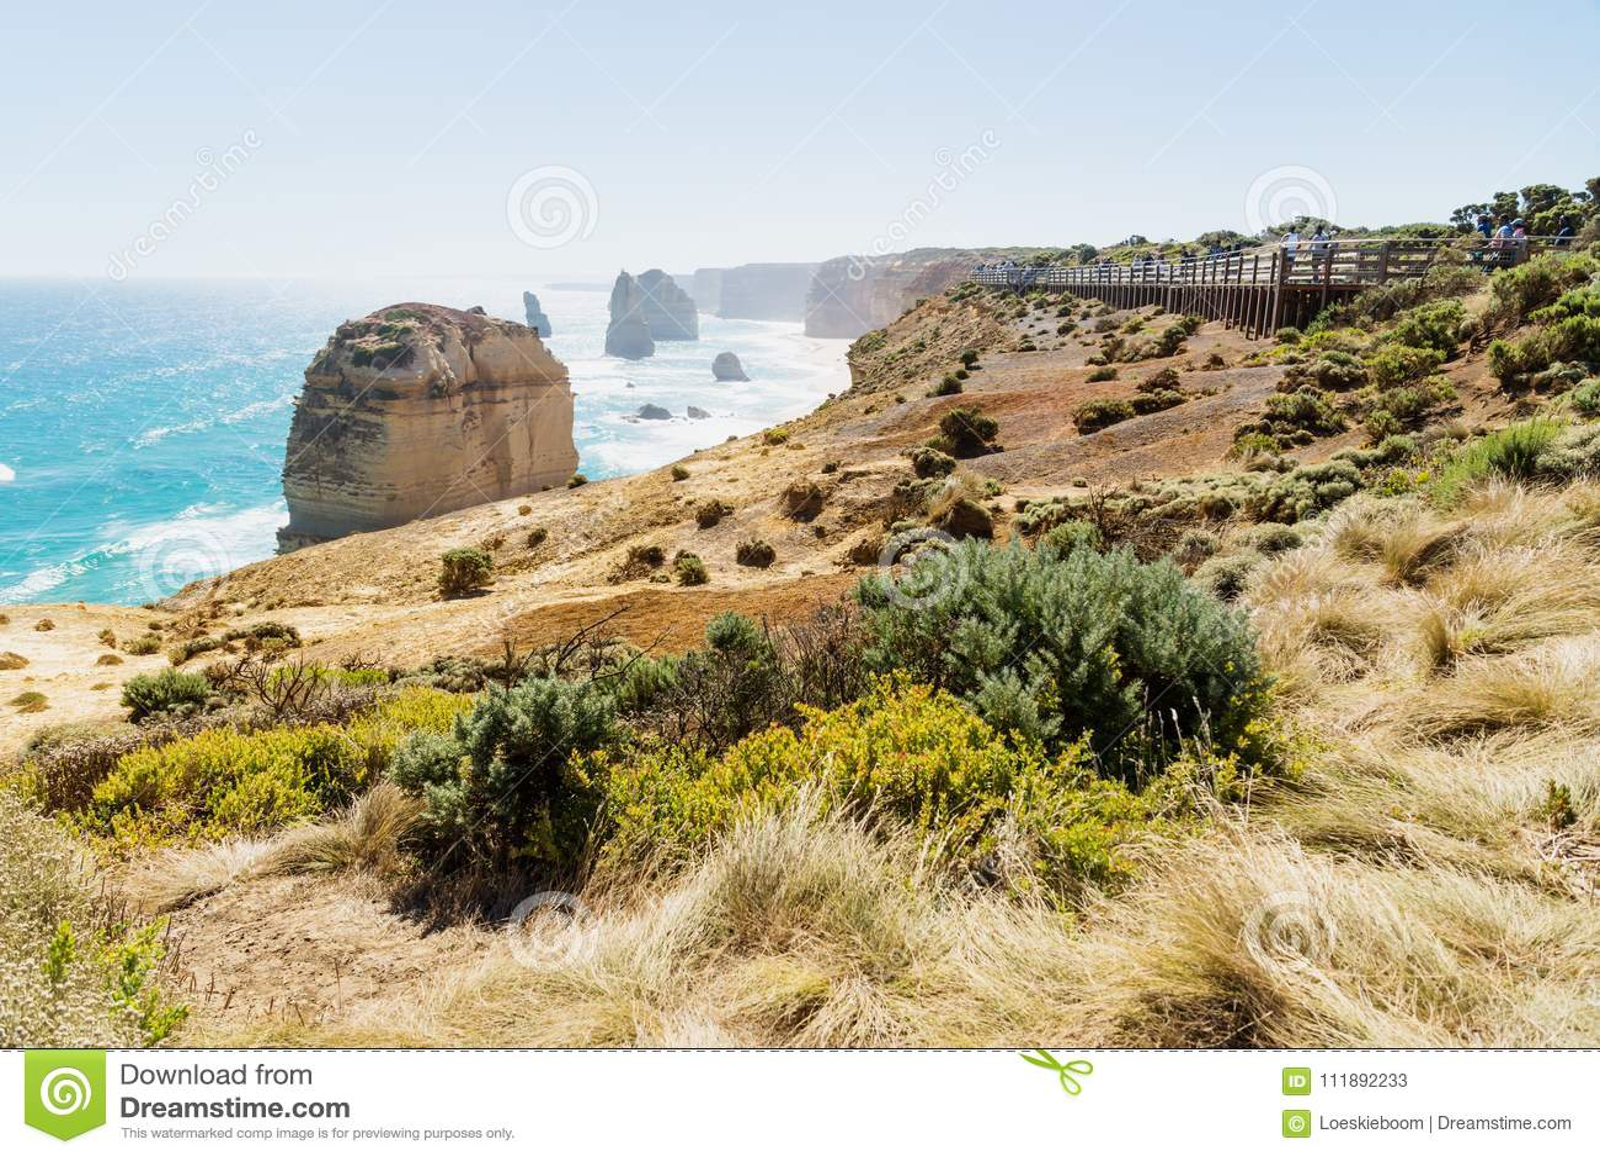 Lookout at Twelve Apostels at the Great Ocean Road, Victoria, Australia